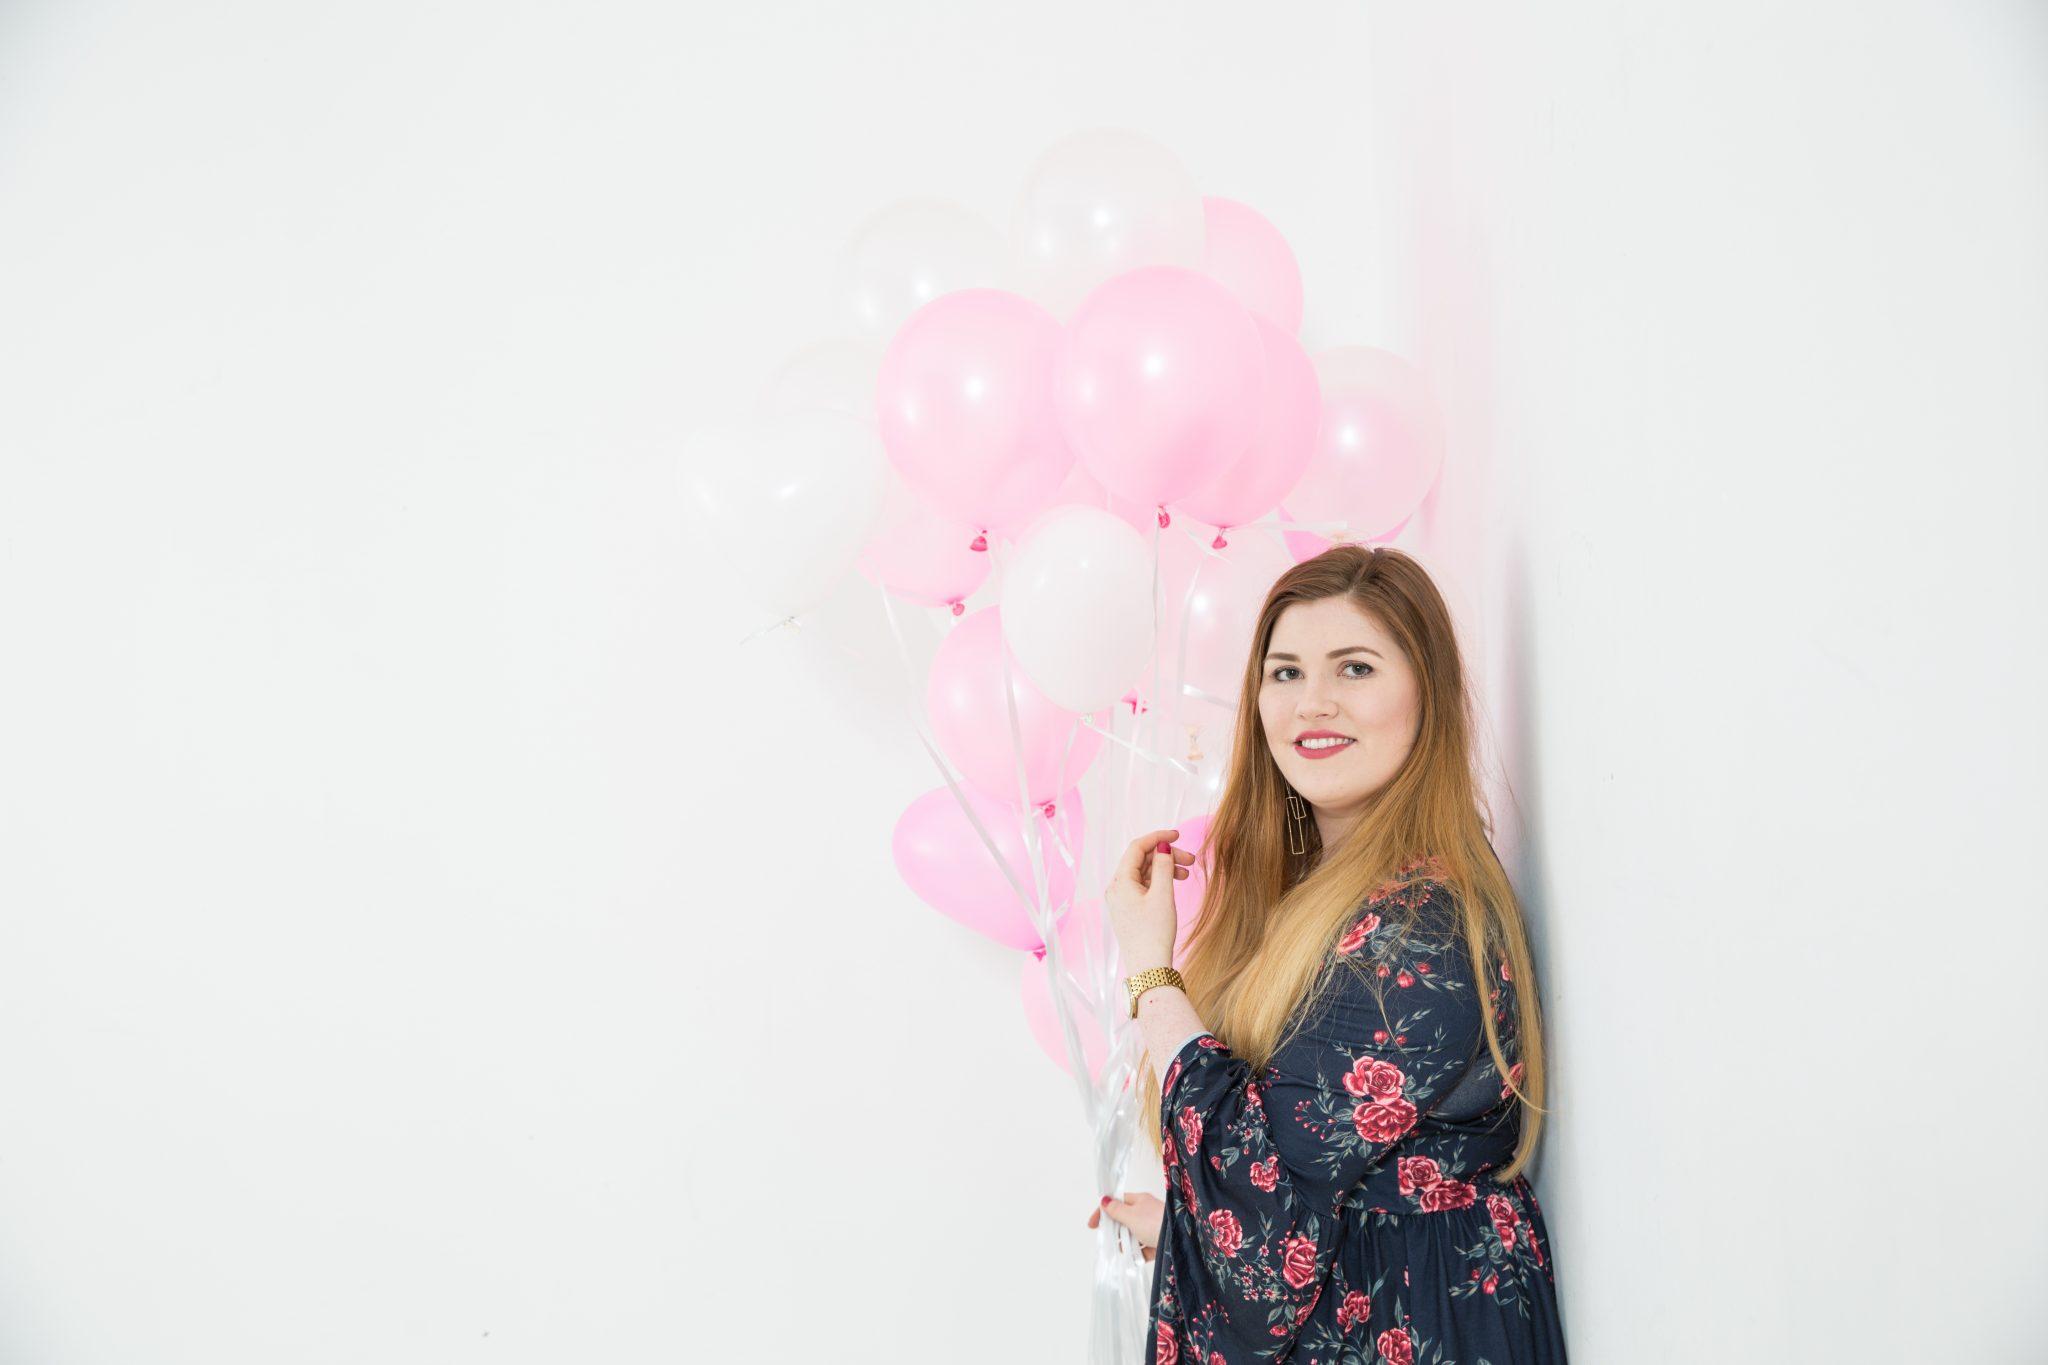 hausbau-blog-instagram-luftballon-bild